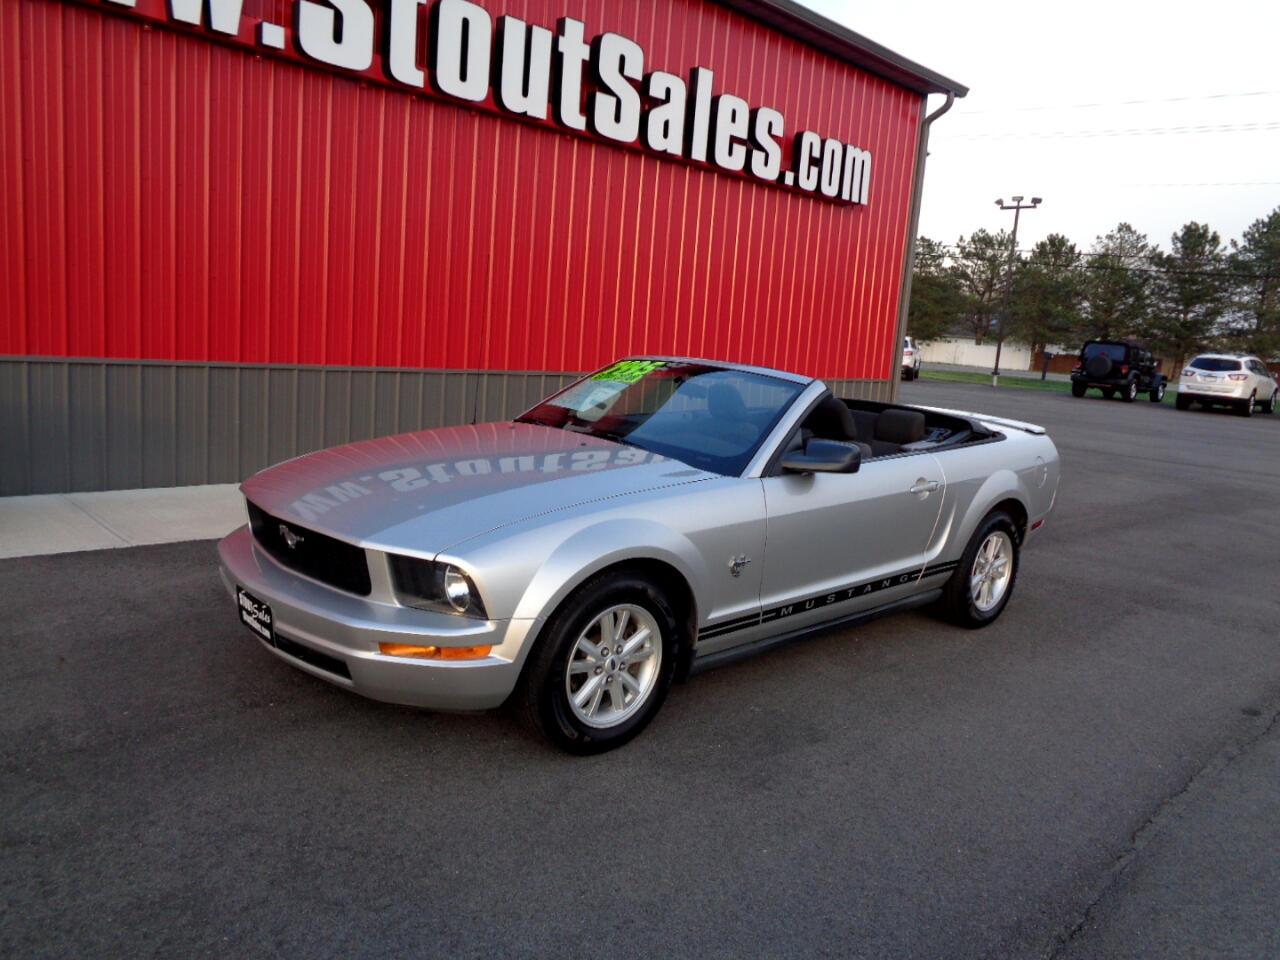 Ford Mustang V6 Convertible 2009